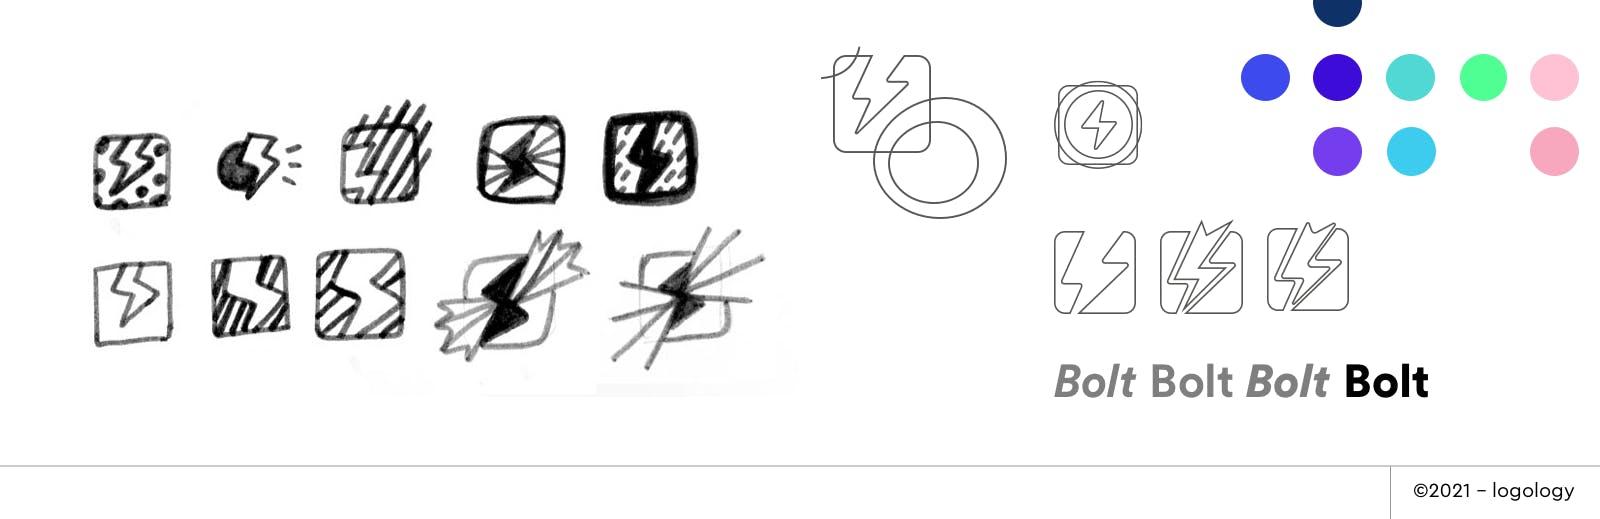 bolt logo design sketches